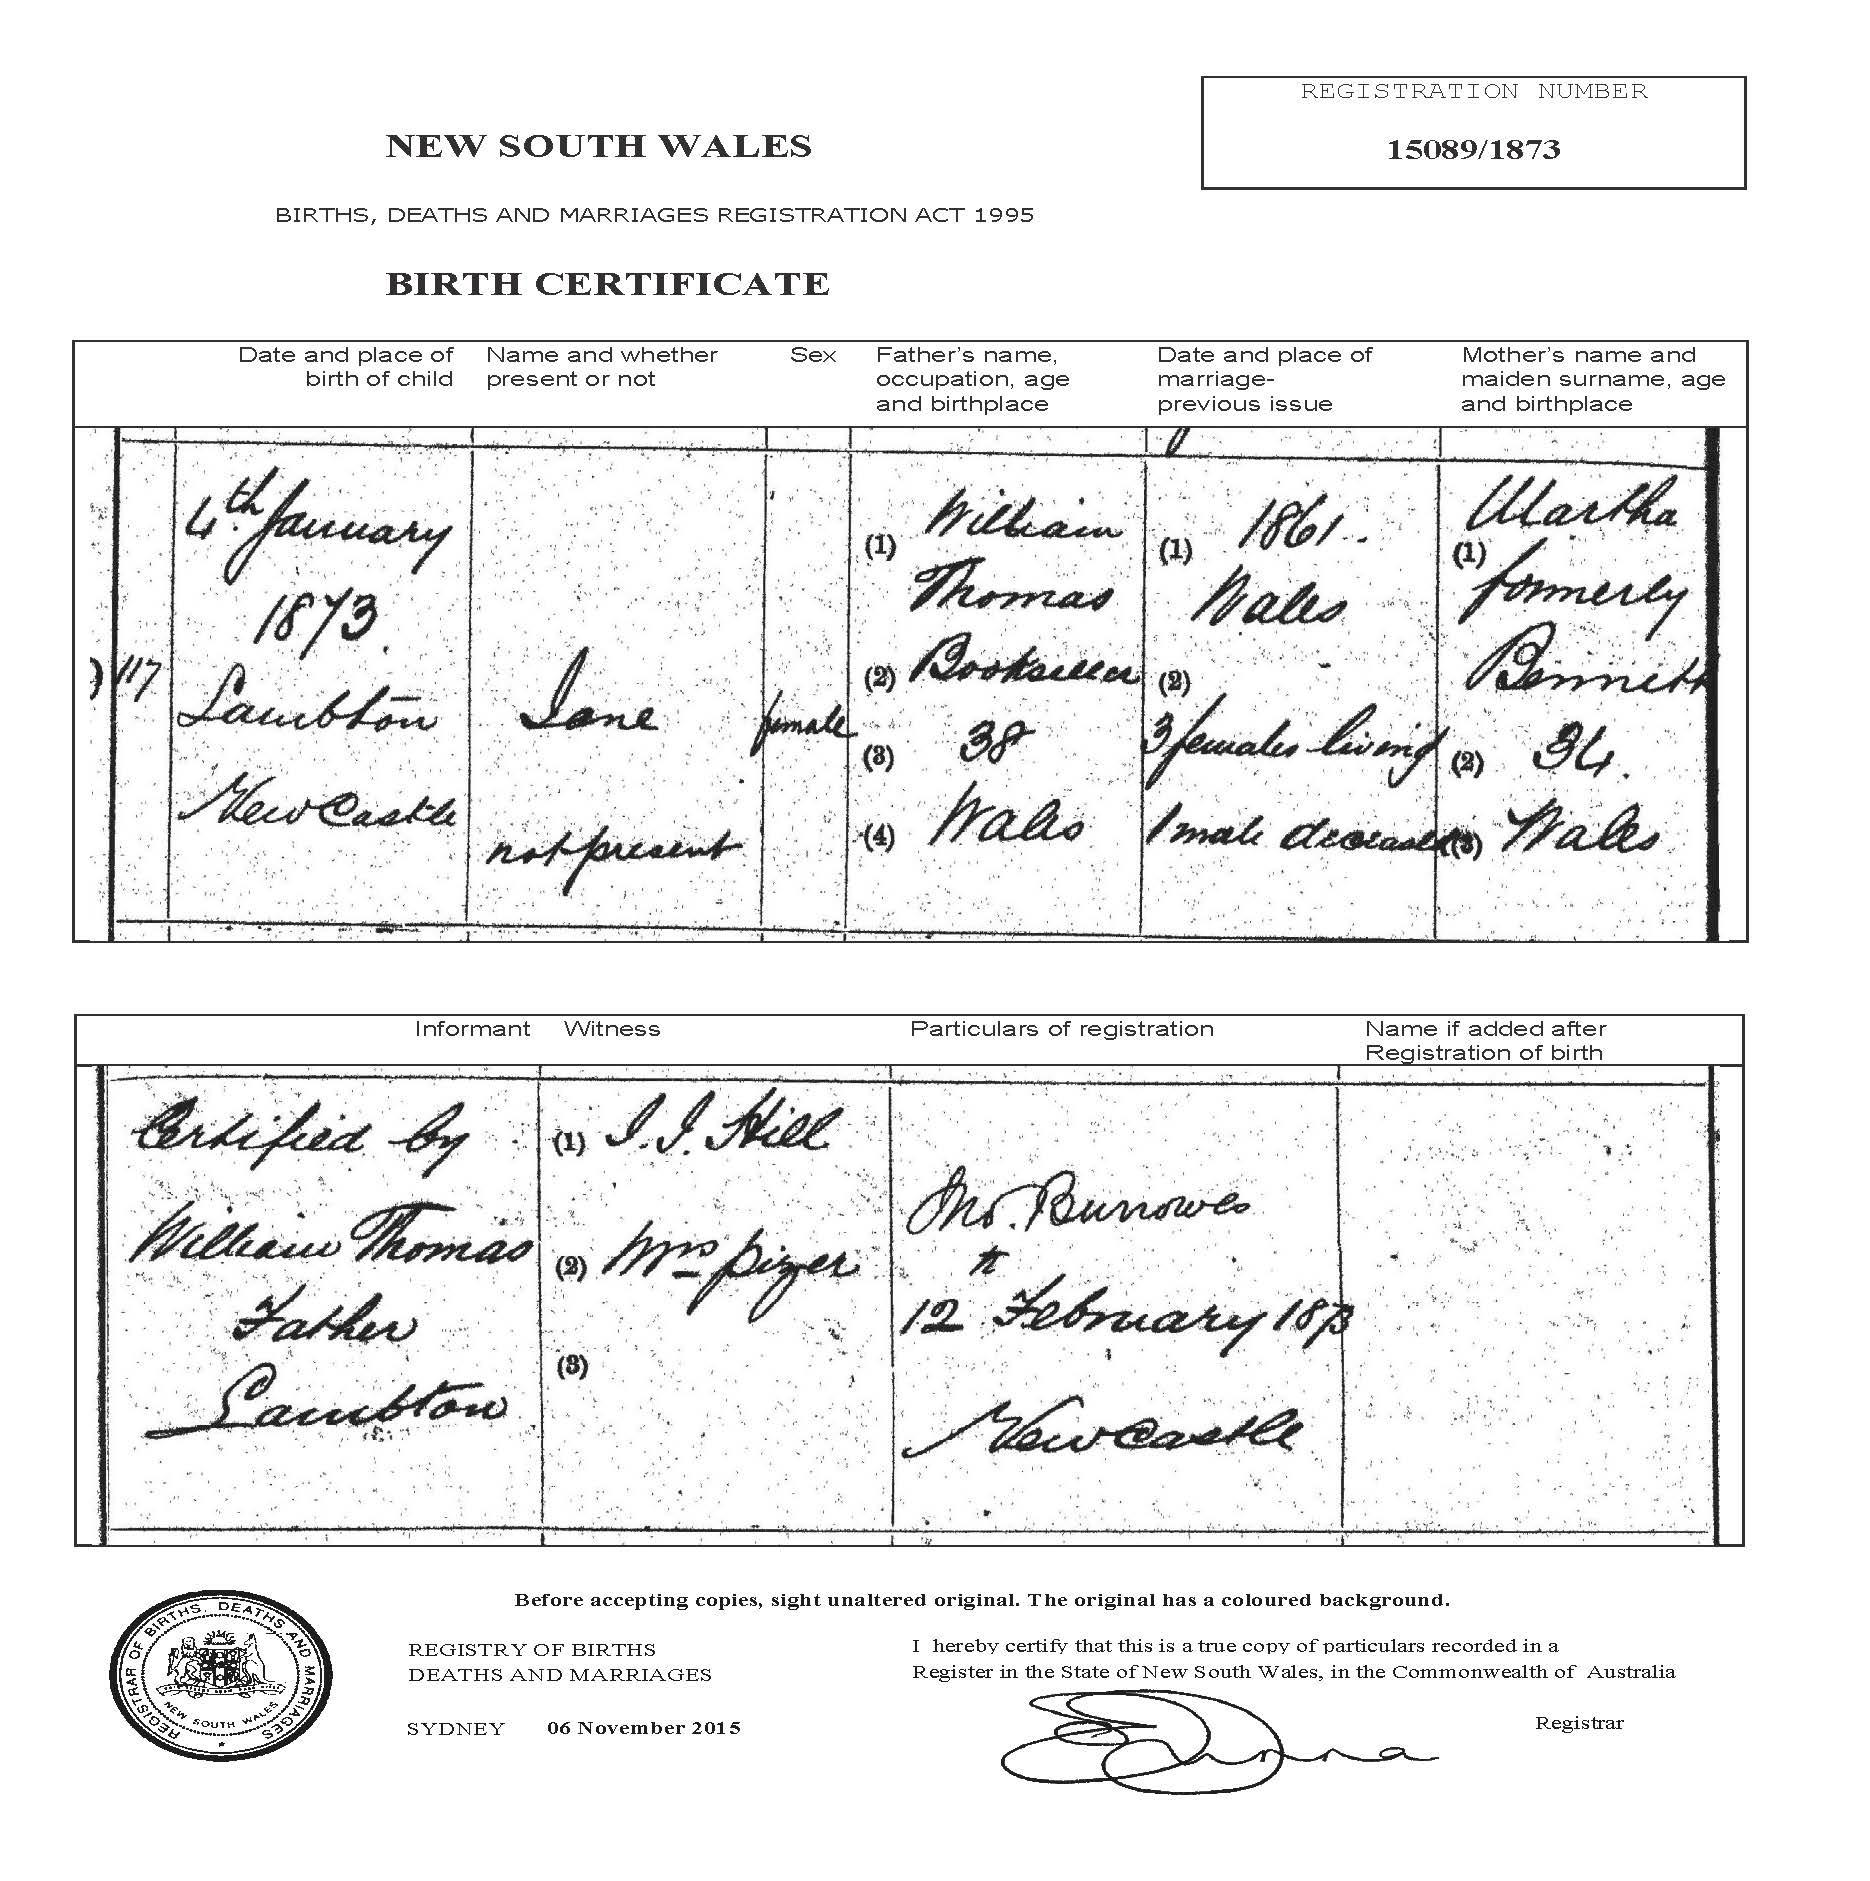 William thomas and martha jane bennett documents birth certificate 1betcityfo Gallery